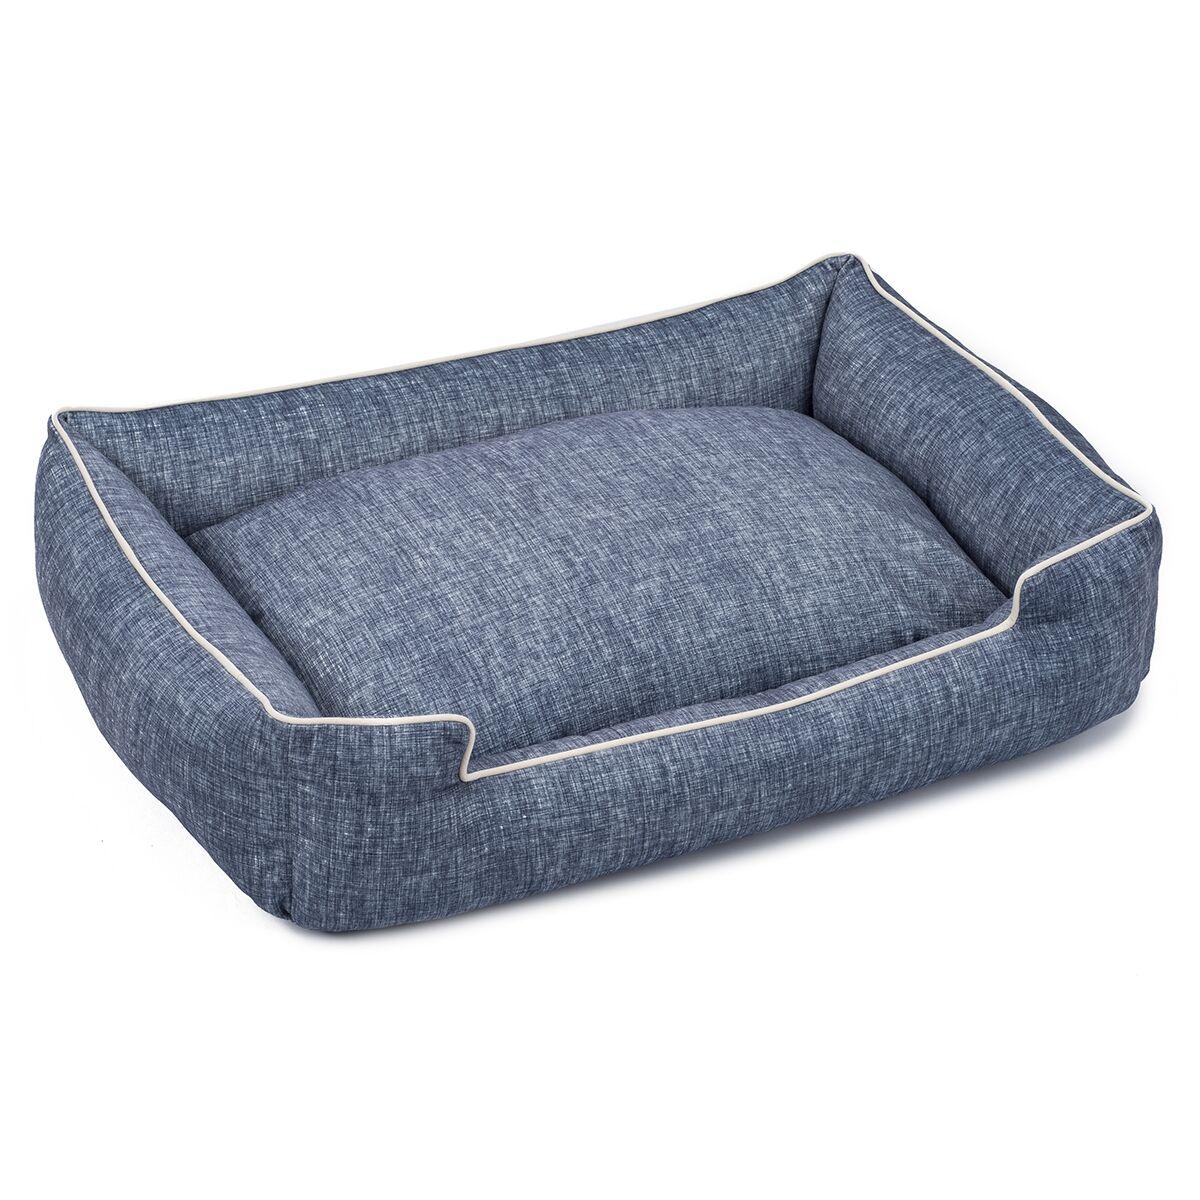 Plush Velour Lounge Dog Bed Size: Small (18